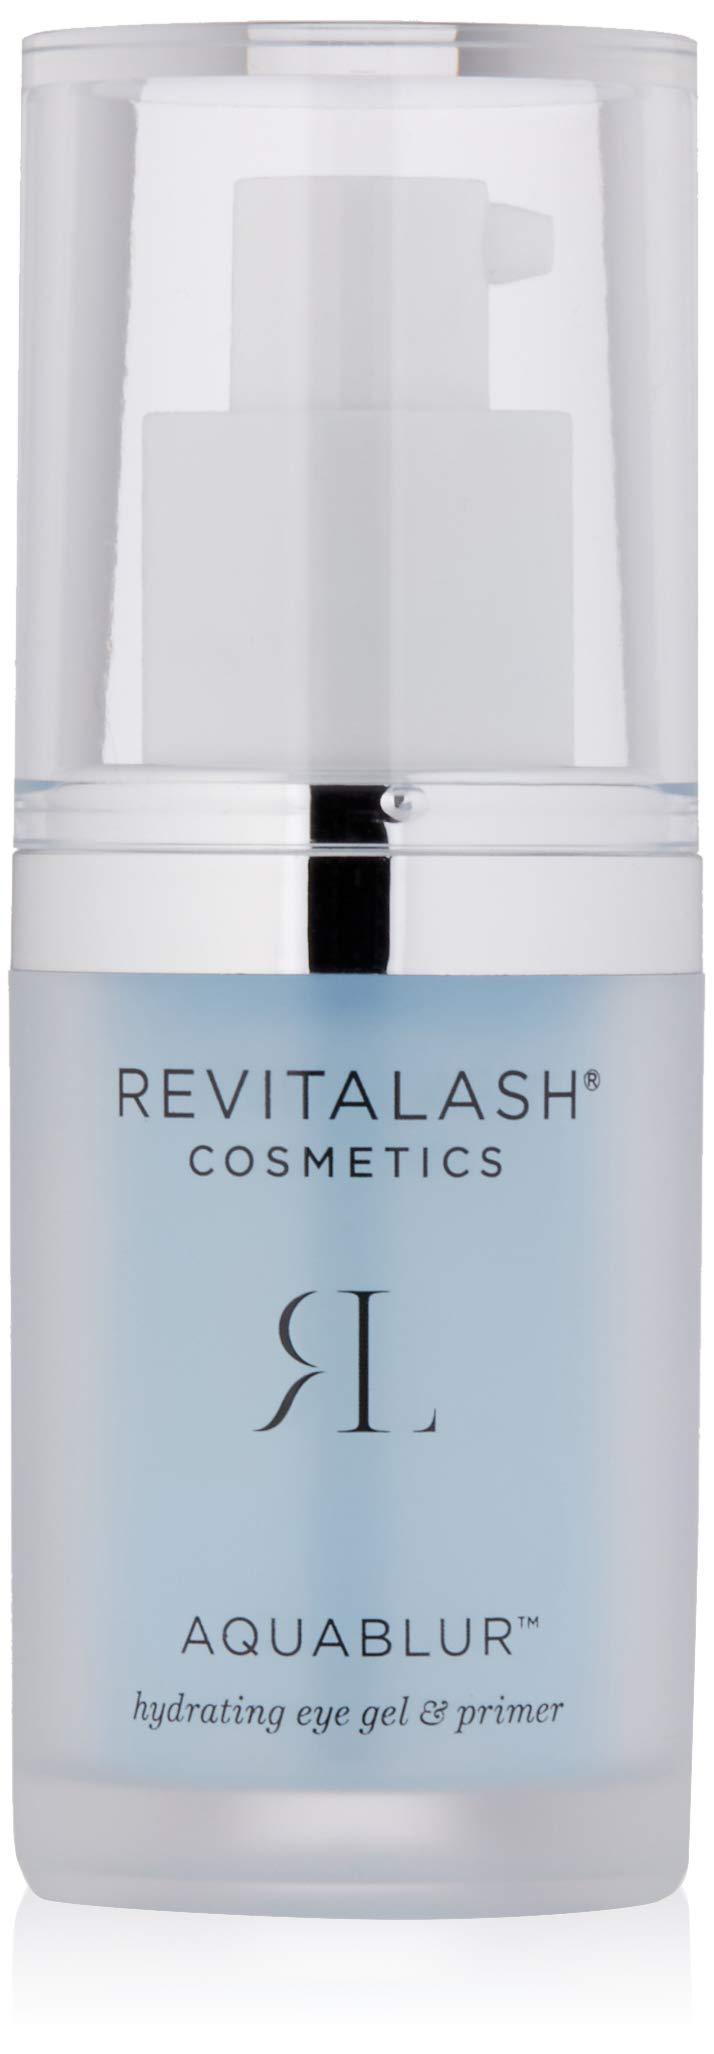 RevitaLash Cosmetics, Aquablur Hydrating Eye Gel & Primer, Hypoallergenic & Cruelty Free by RevitaLash Cosmetics